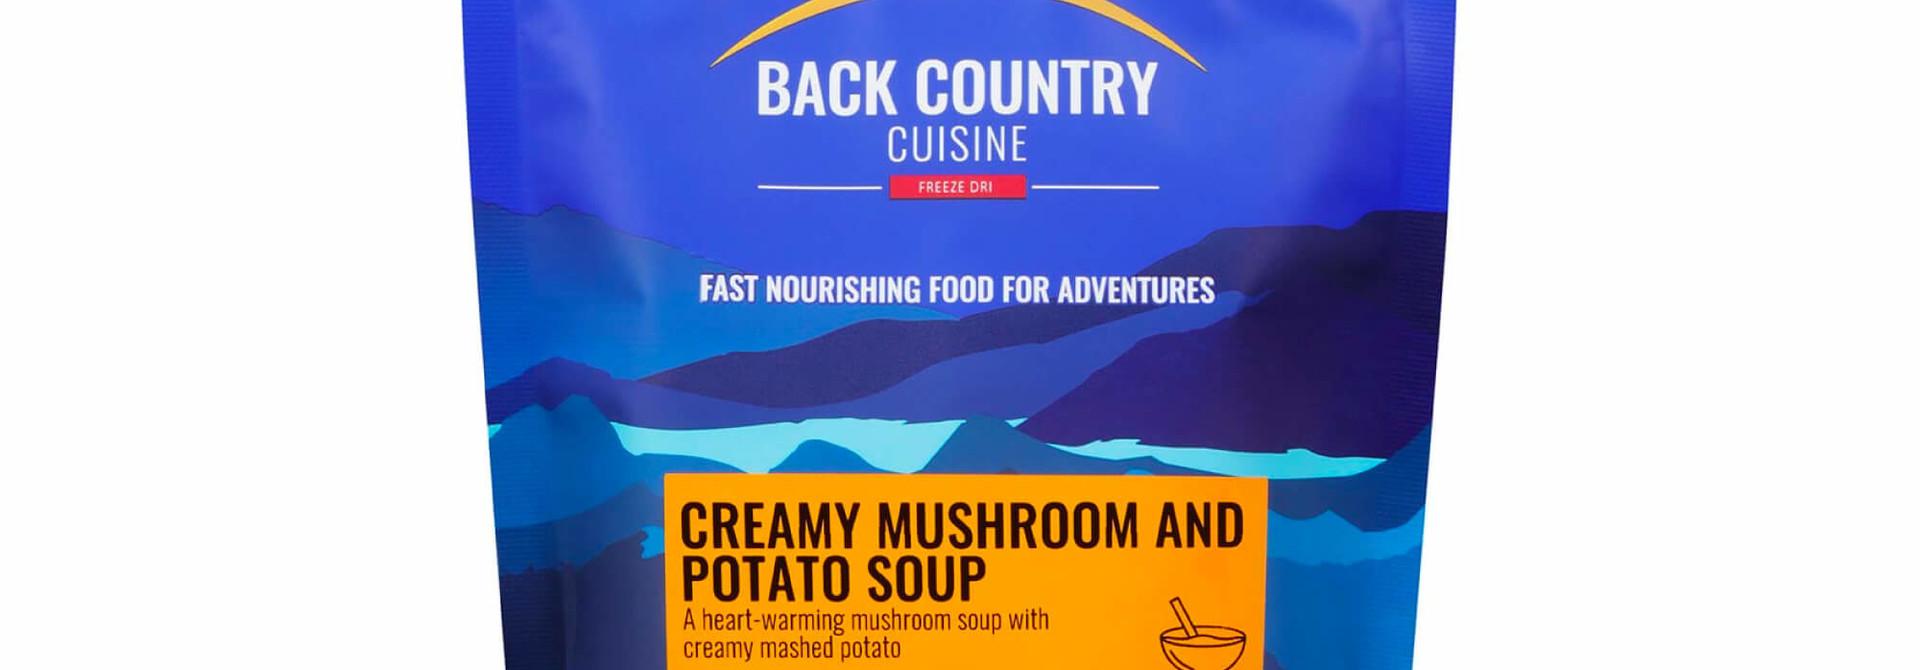 Back Country Cuisine Creamy Mushroom & Potato Soup Regular